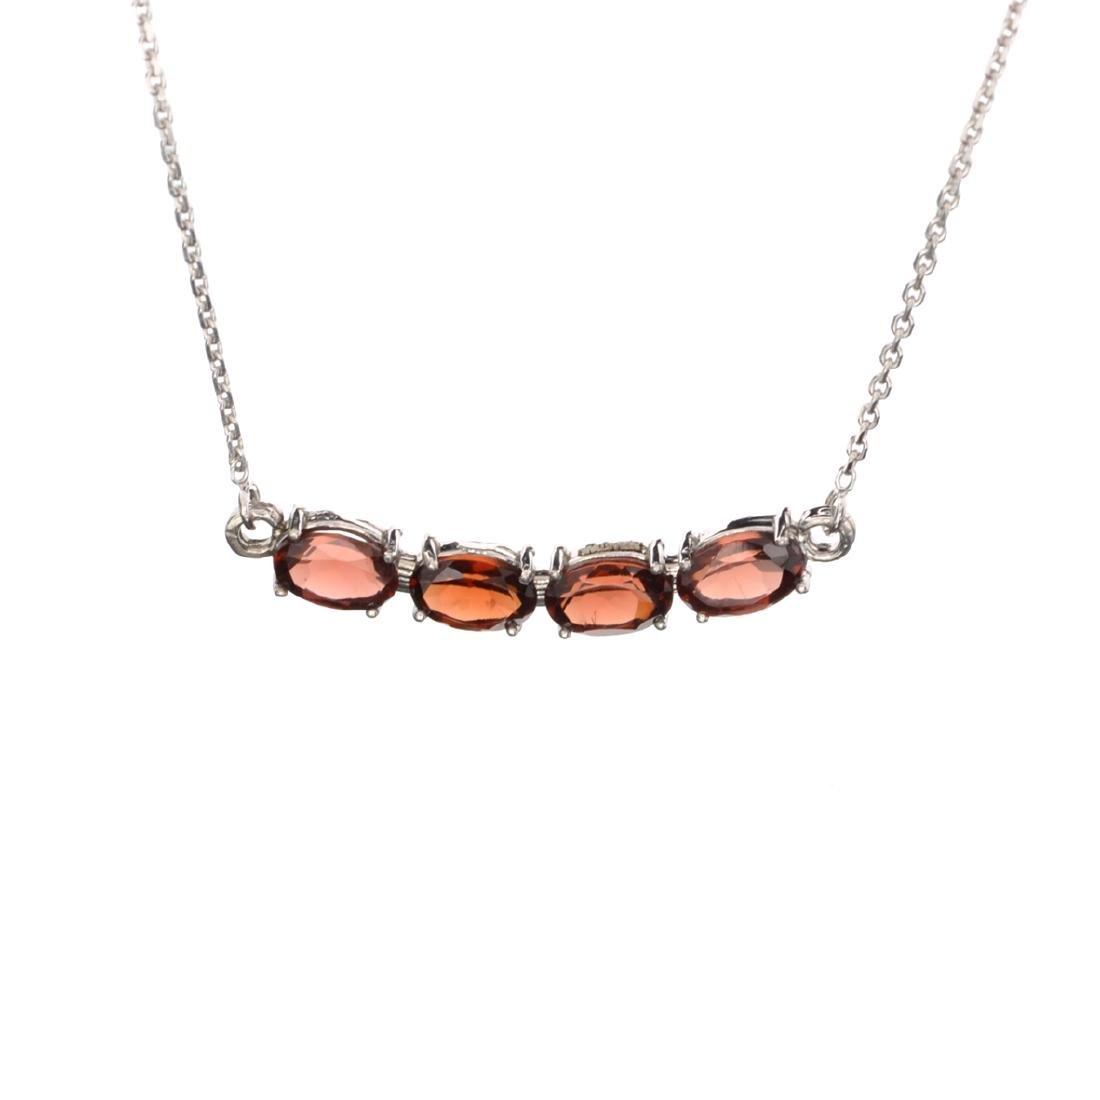 Fine Jewelry Designer Sebastian 2.25CT Oval Cut